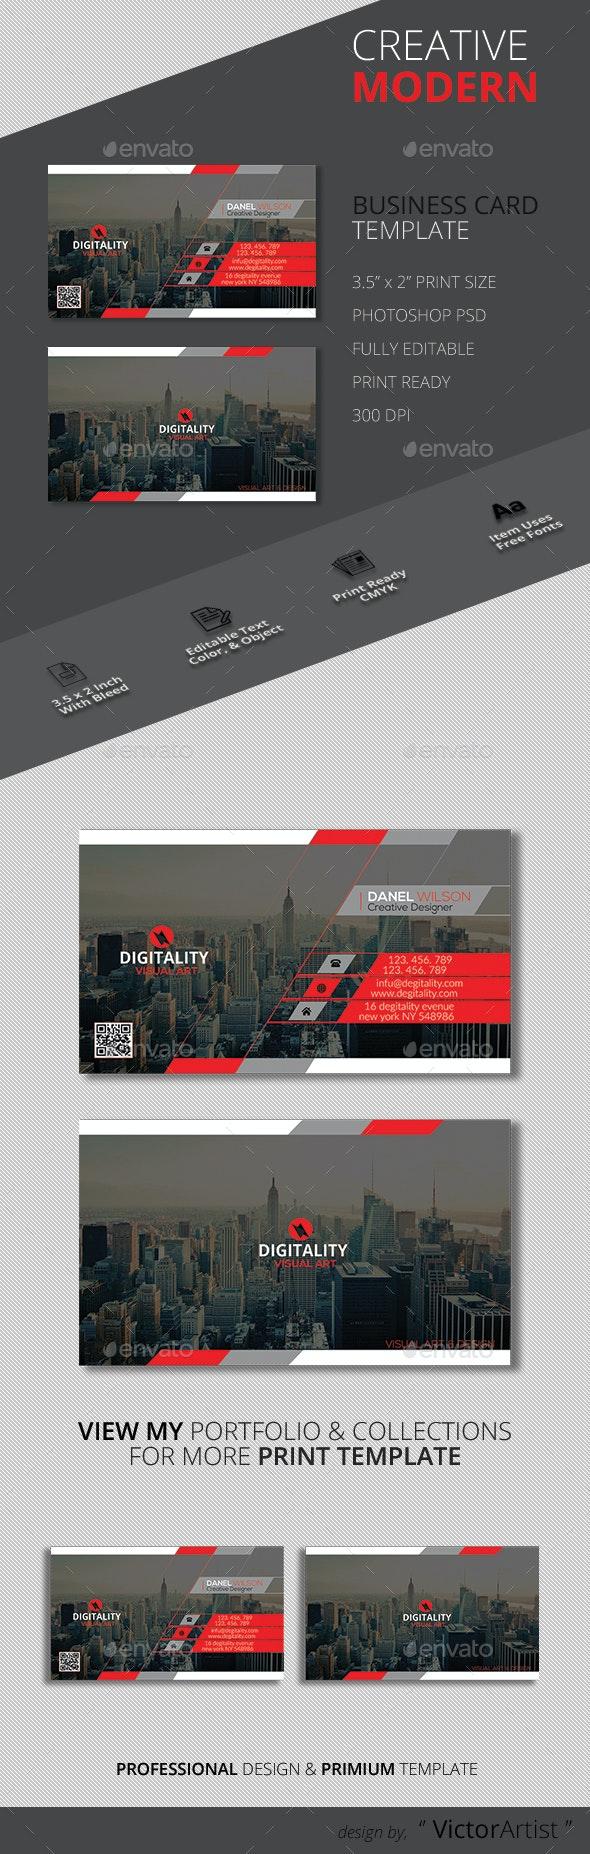 Creative Modern Business Card Template - Corporate Business Cards